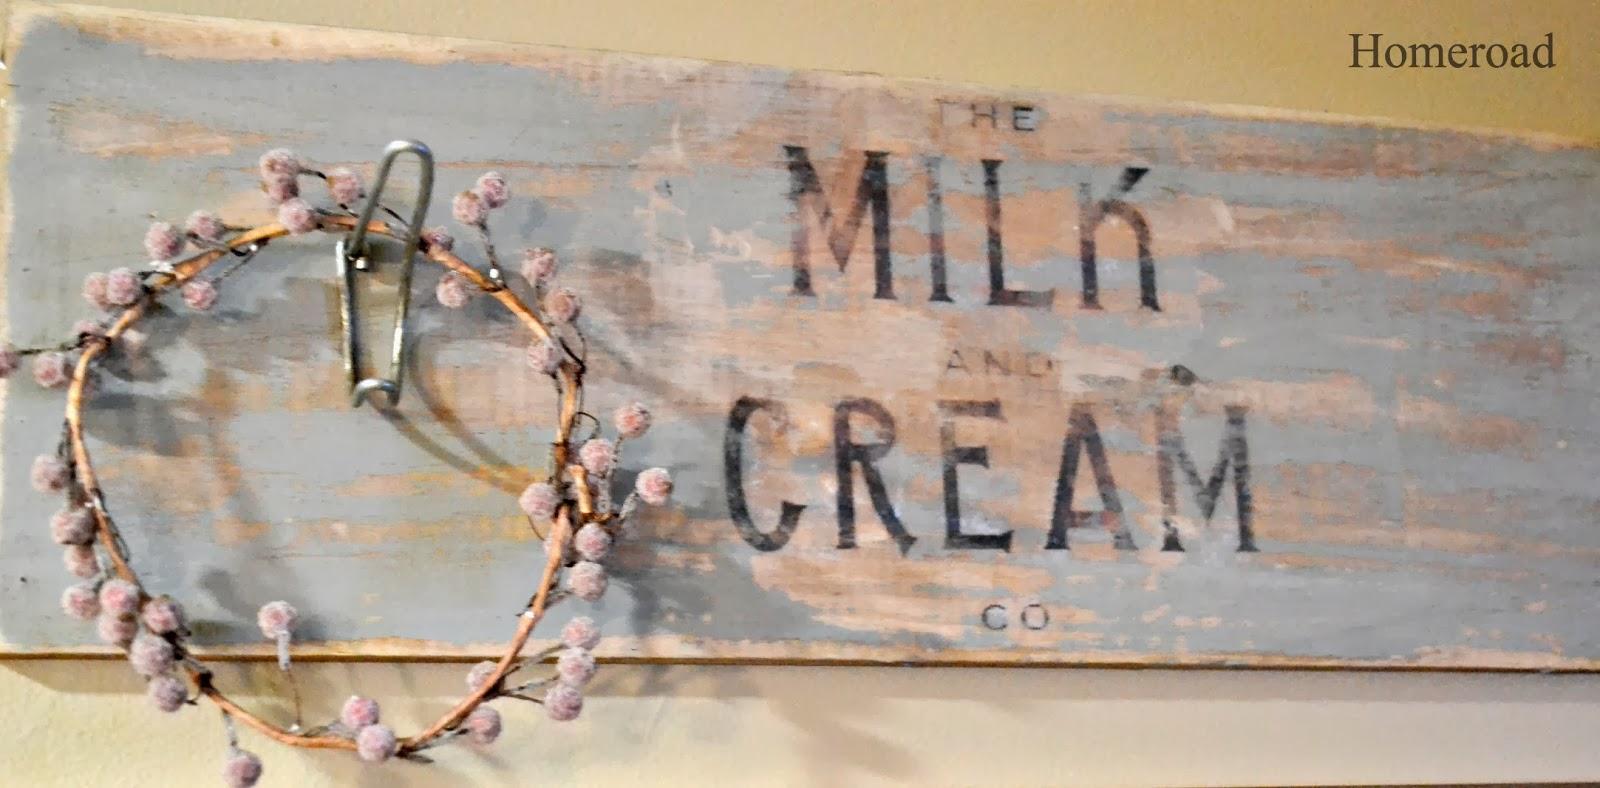 milk and cream crate sign www.homeroad.net